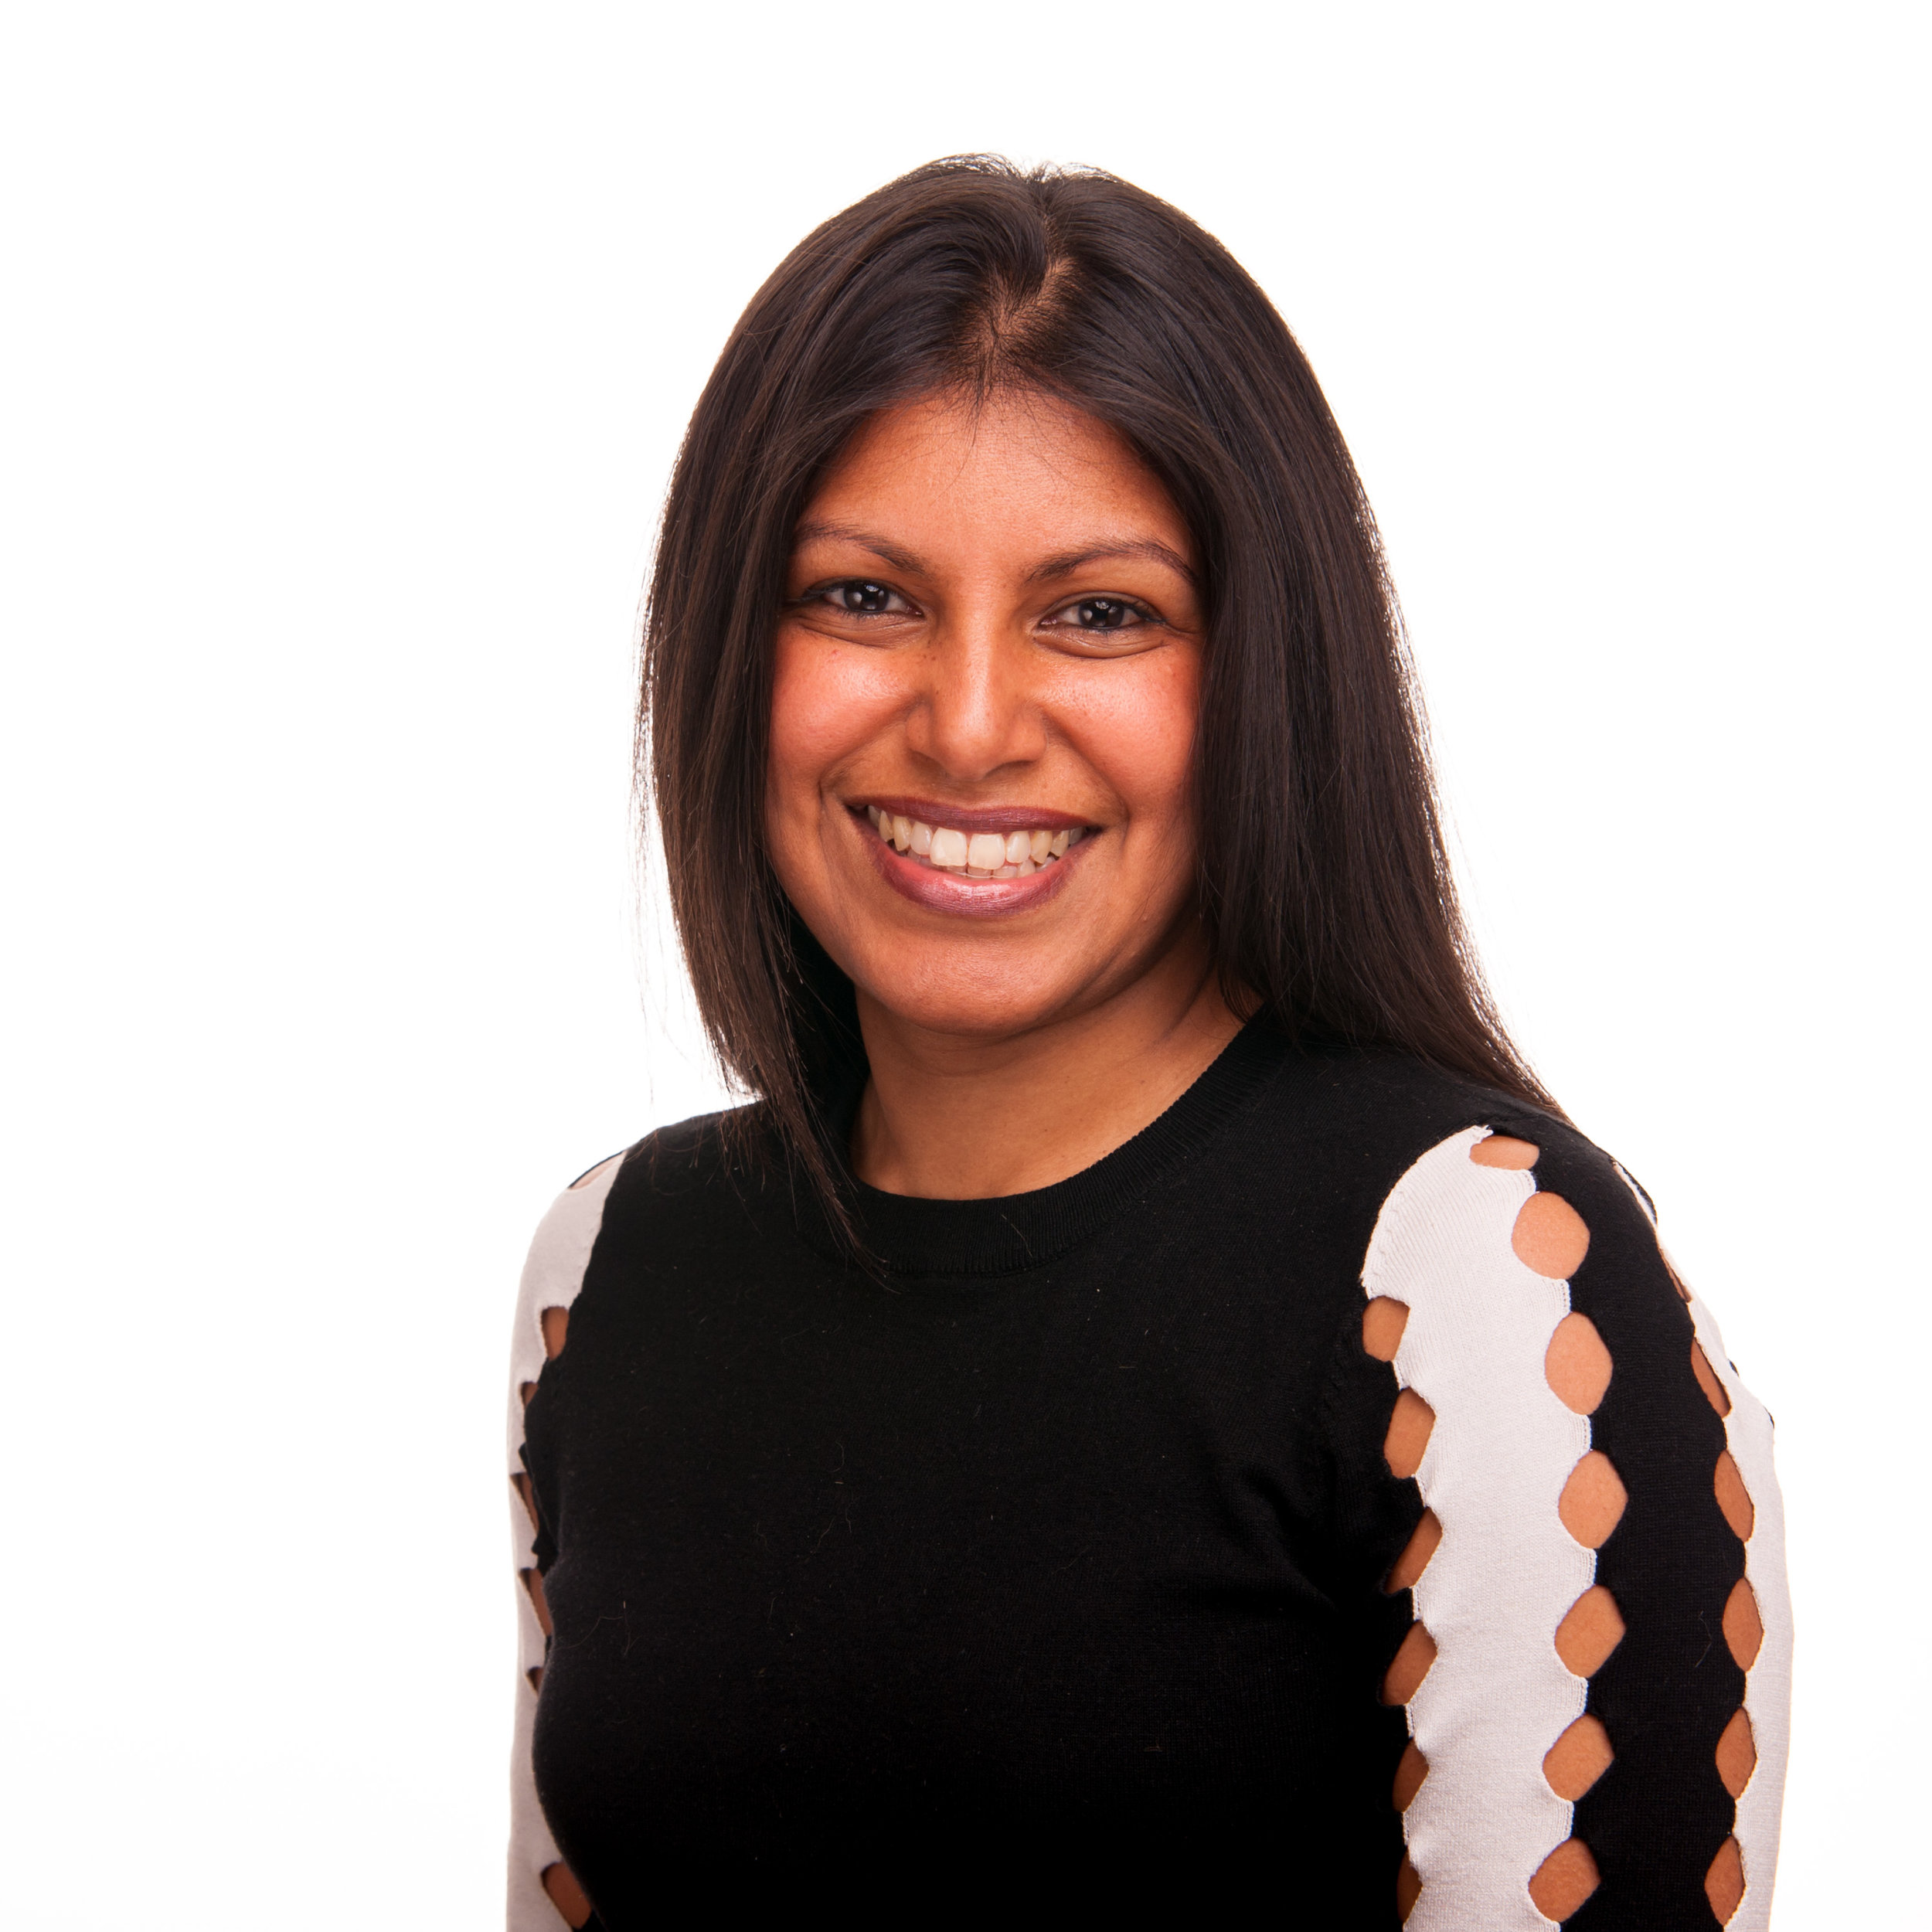 Sabeena-8.jpg